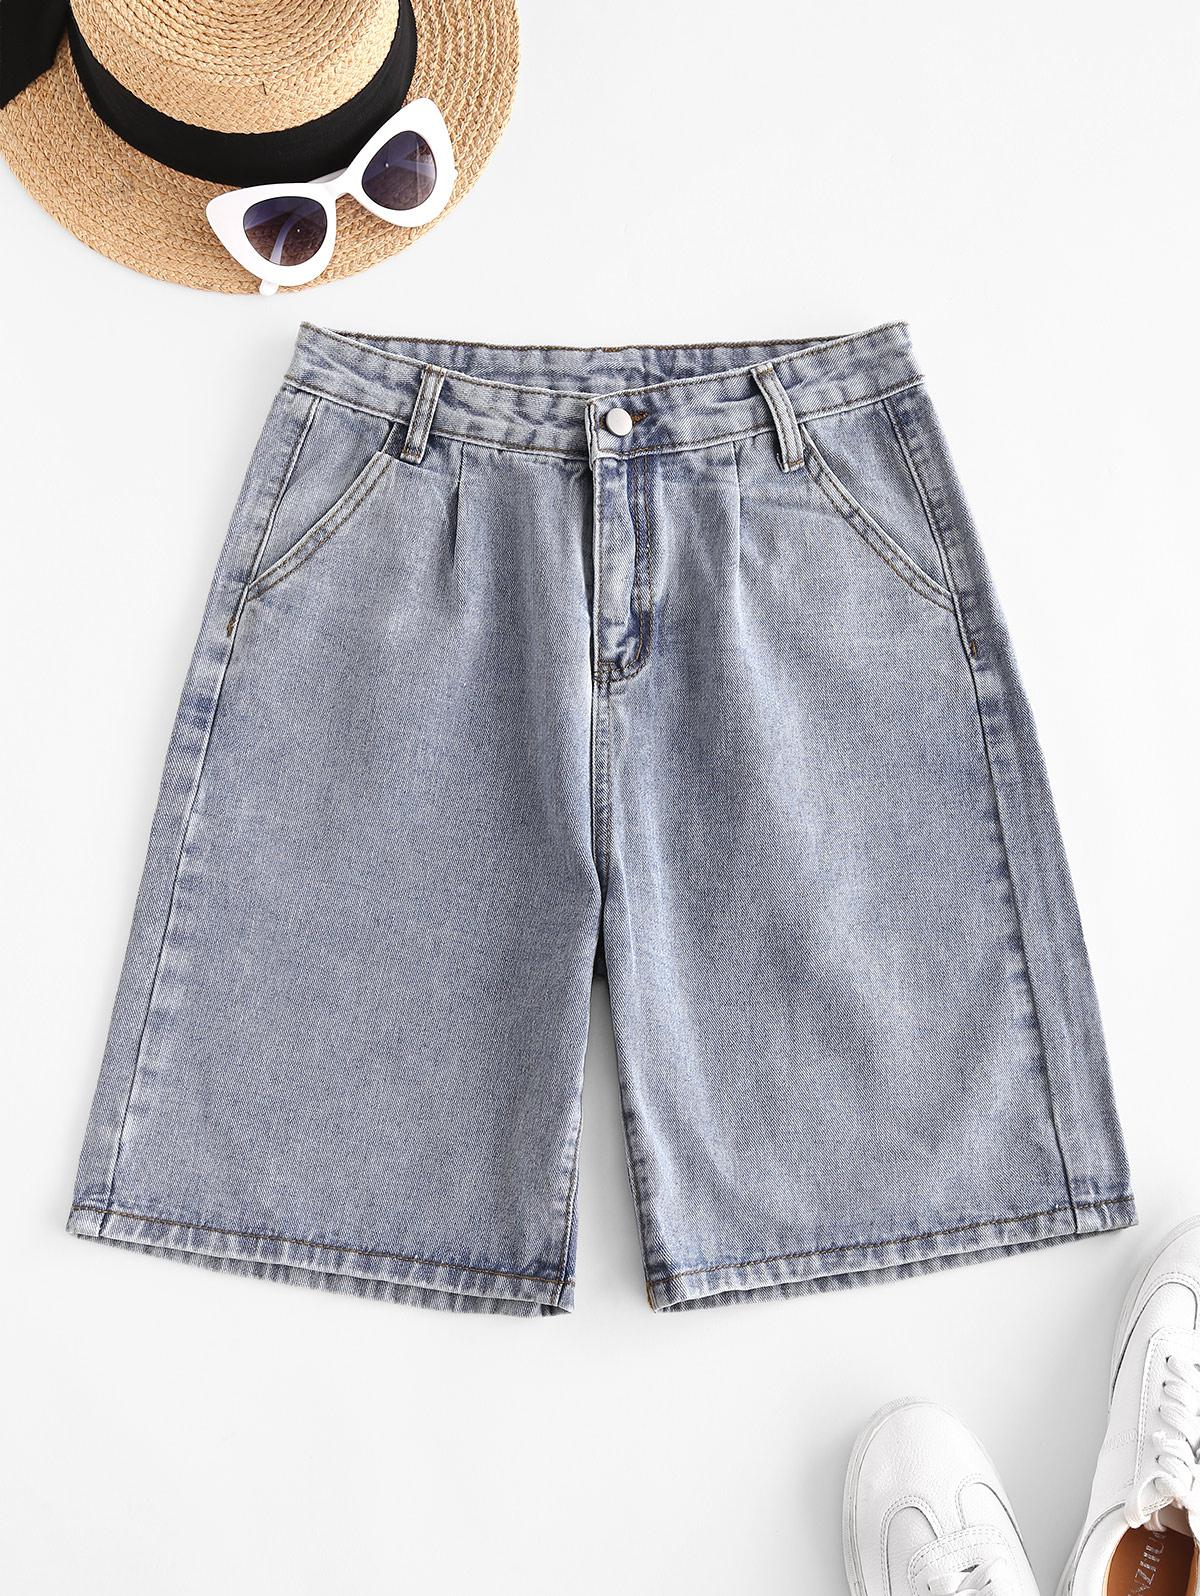 Zipper Fly Pocket Bermuda Denim Shorts